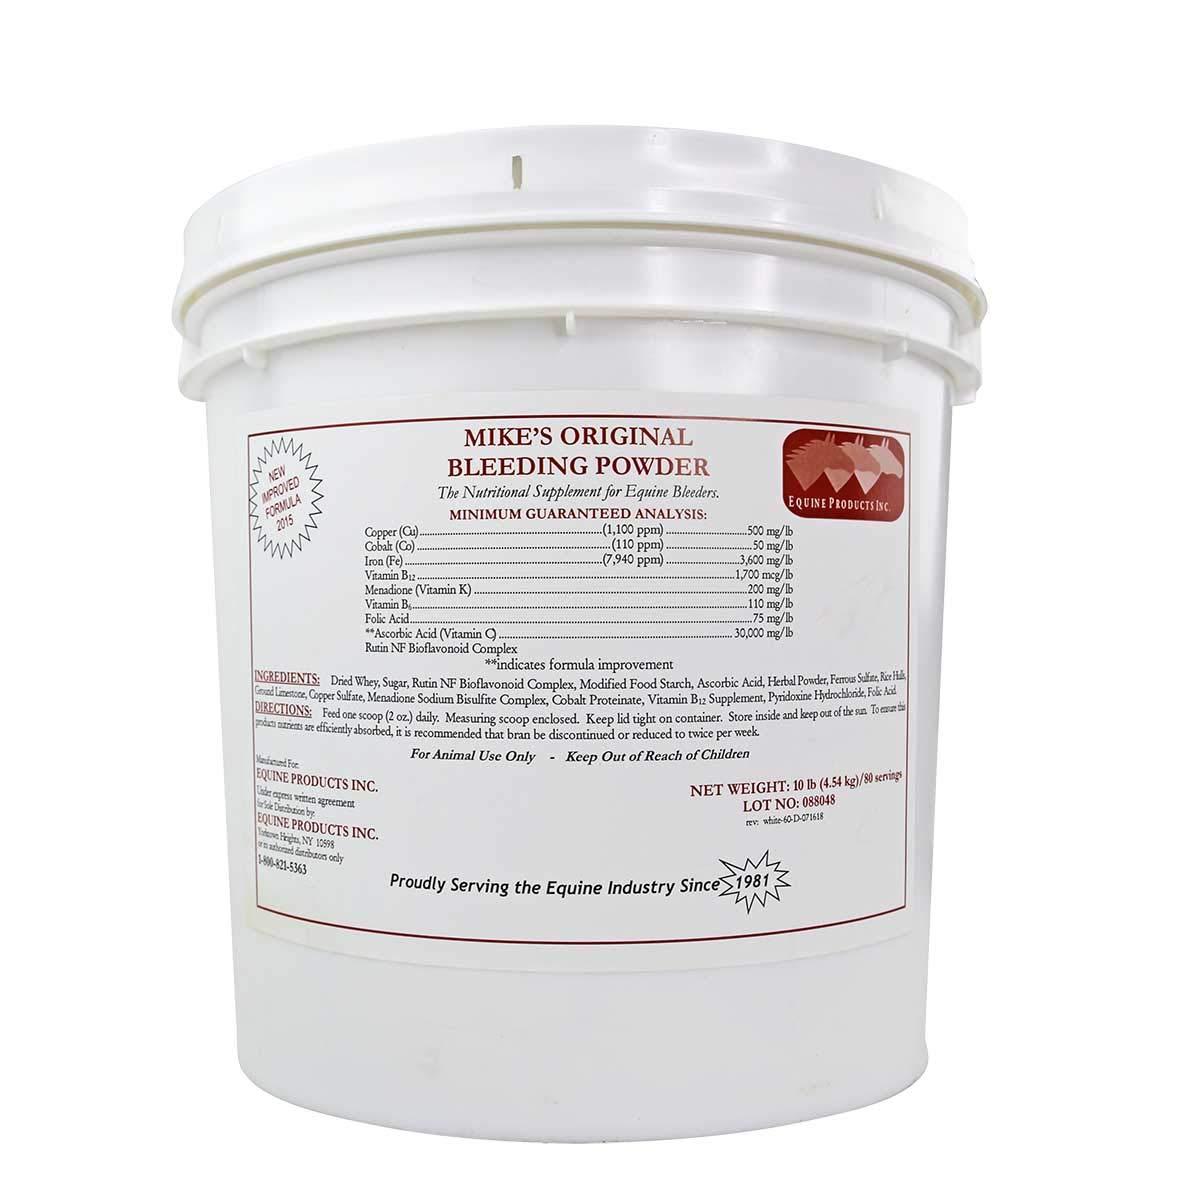 Equine Products Inc Mikes Original Bleeding Powder 10 lbs